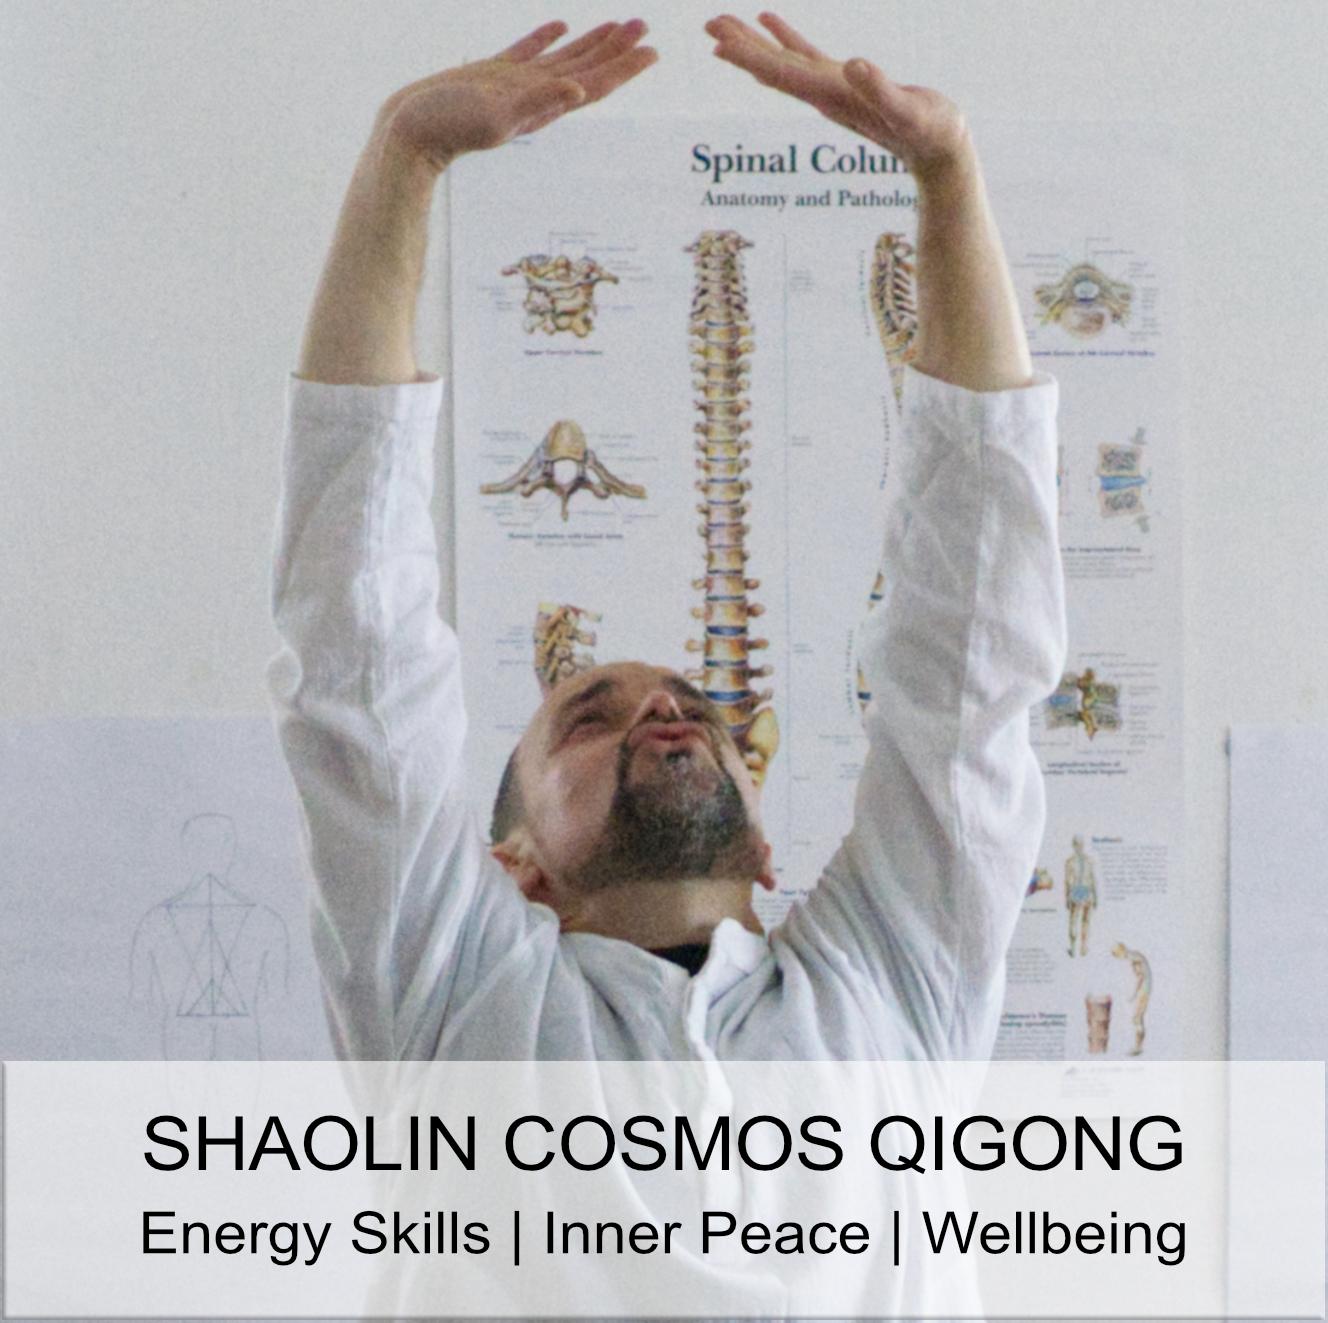 Shaolin Cosmos Qigong Class in Chichester